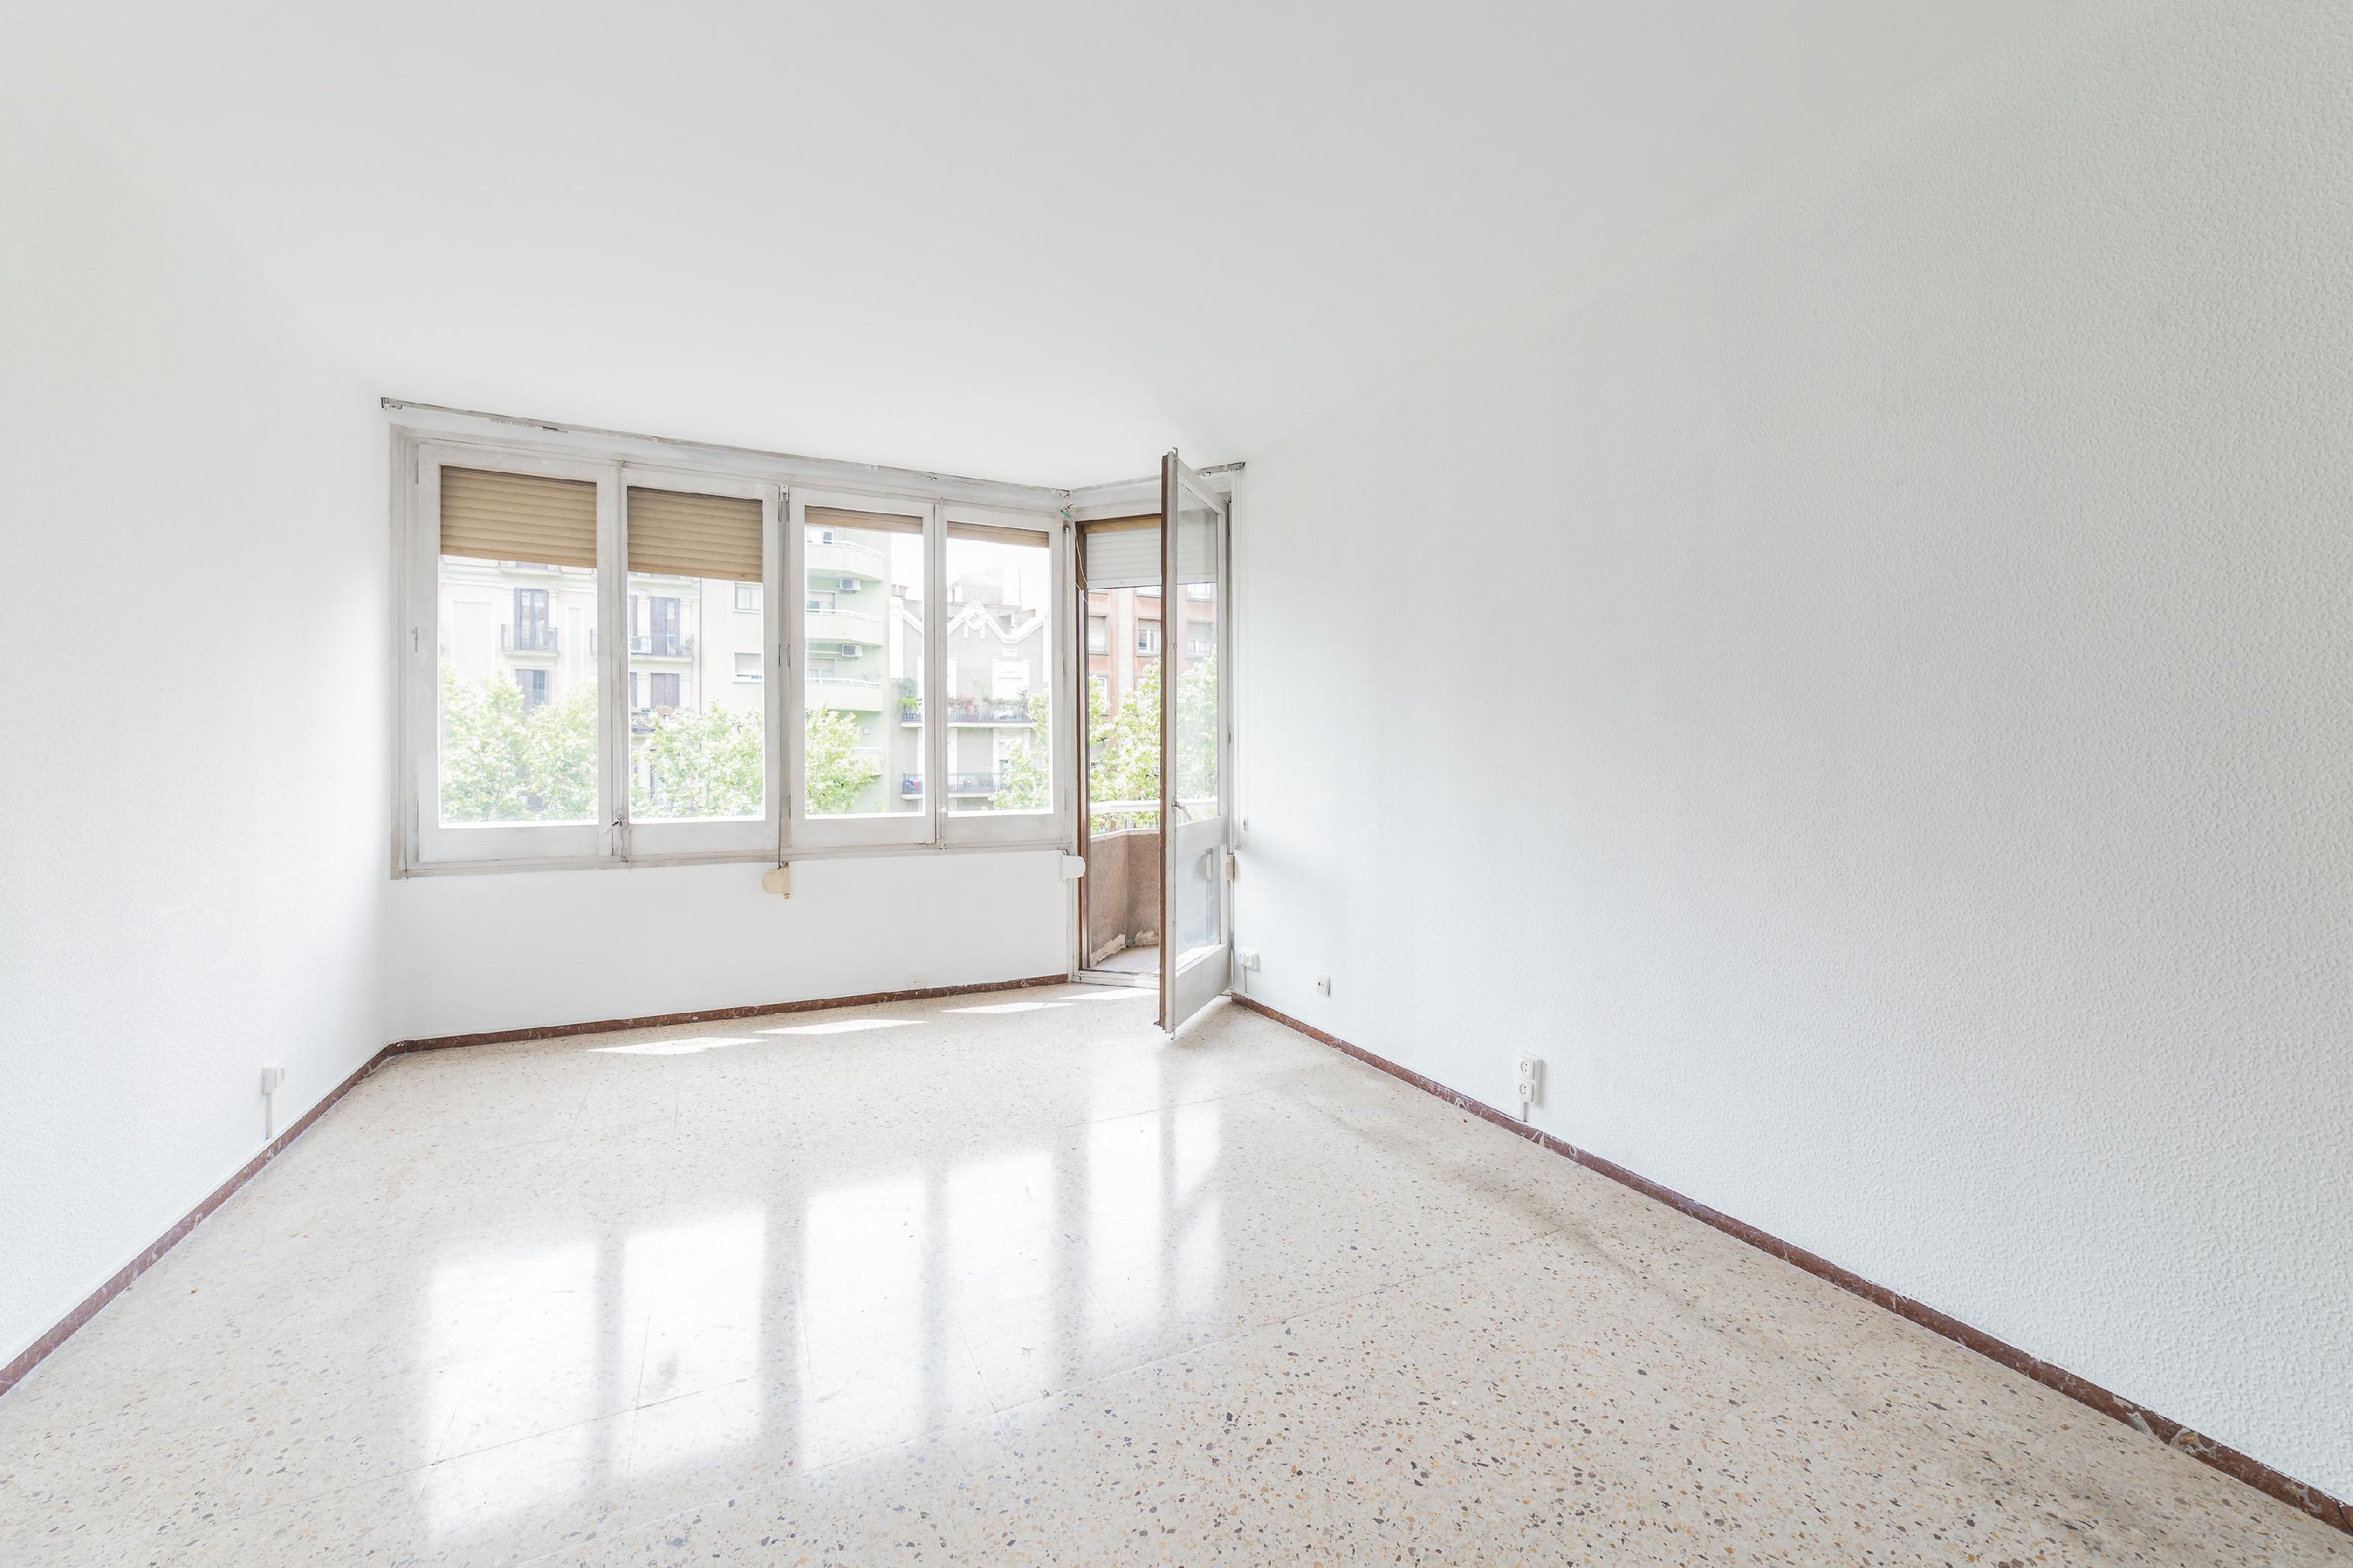 247624 Flat for sale in Eixample, Sant Antoni 4